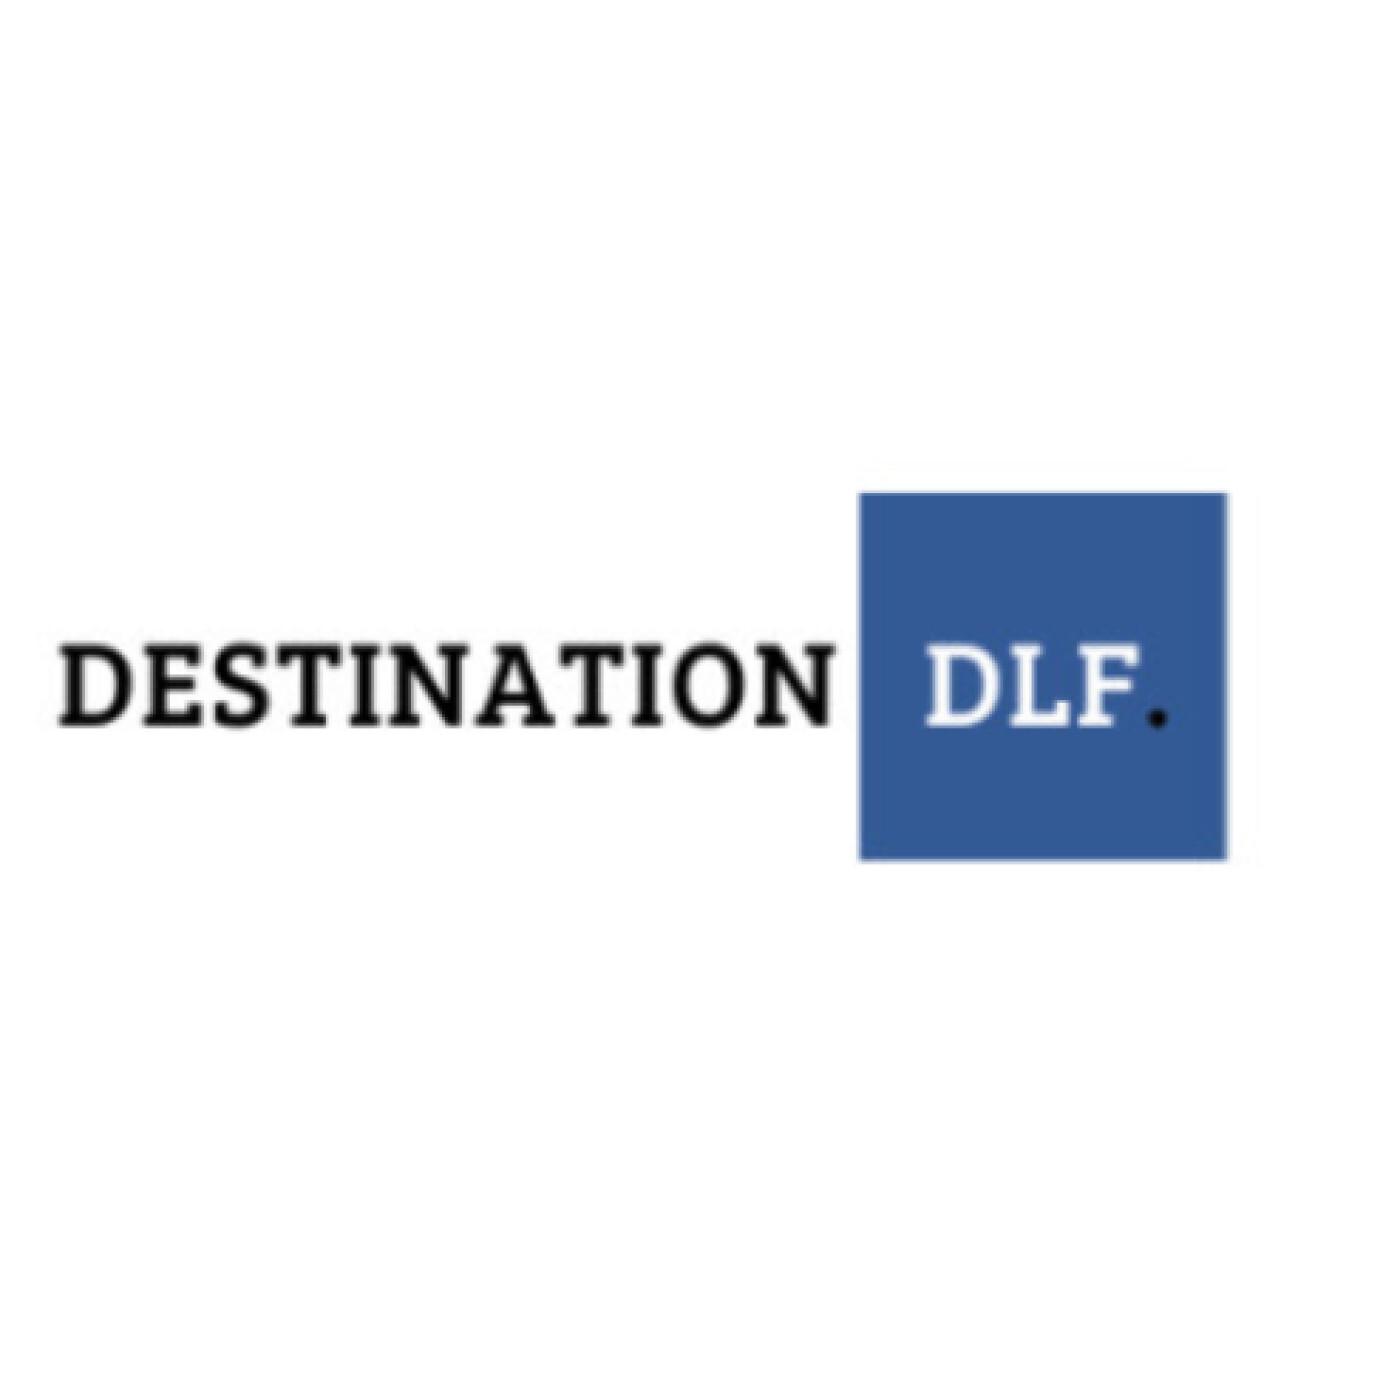 Destination DLF - Actu mars et avril 2021